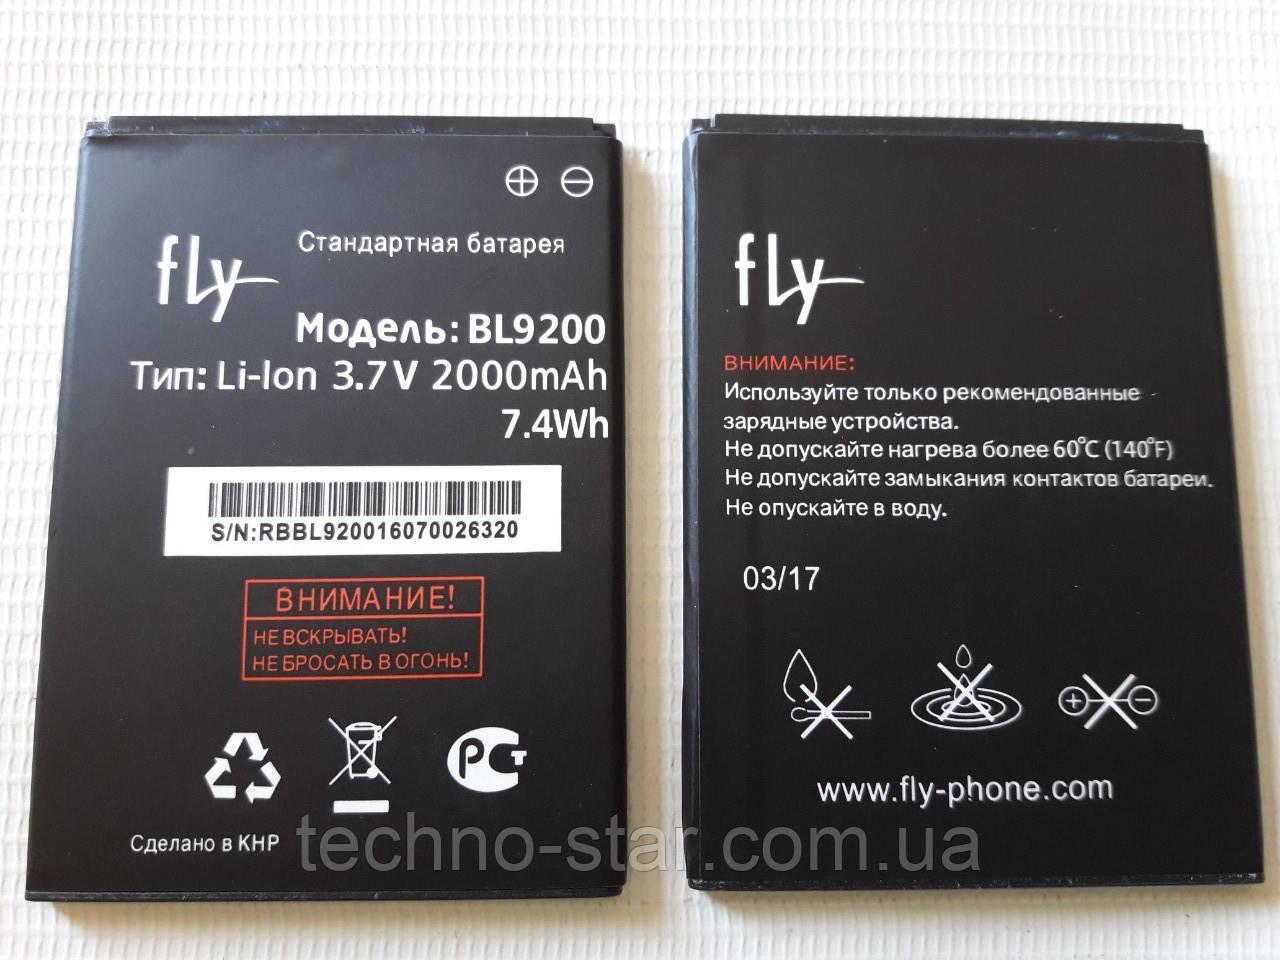 Оригинальный аккумулятор ( АКБ / батарея ) Fly BL9200 для FS504 Cirrus 2 | FS514 Cirrus 8 2000mAh